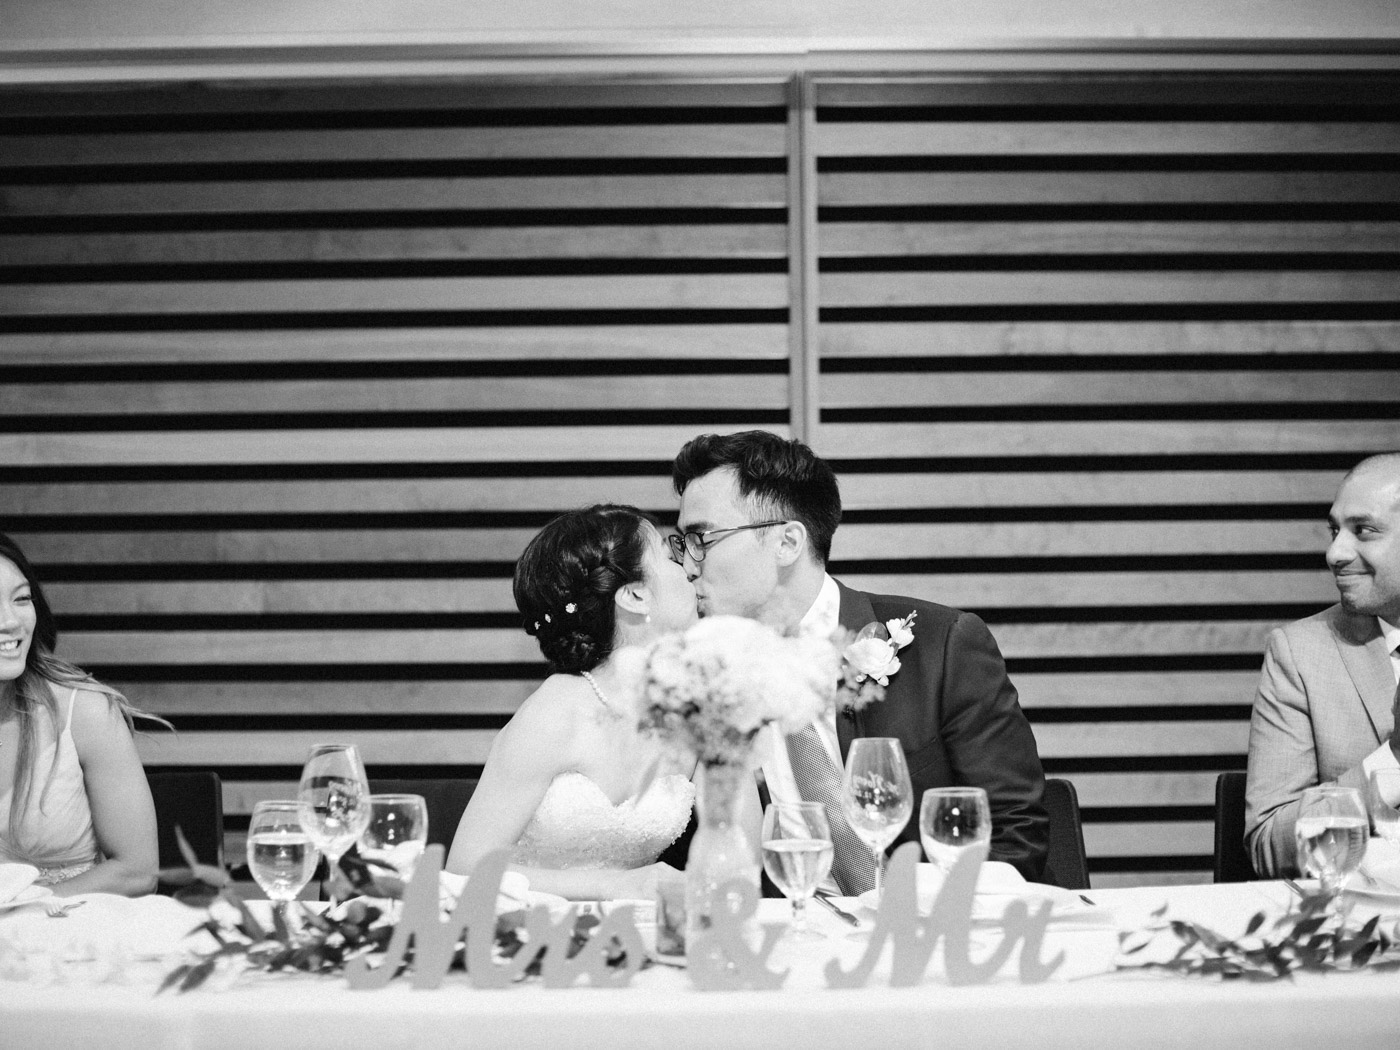 toronto_wedding_photographer_fine_art_documentary_photography-92.jpg